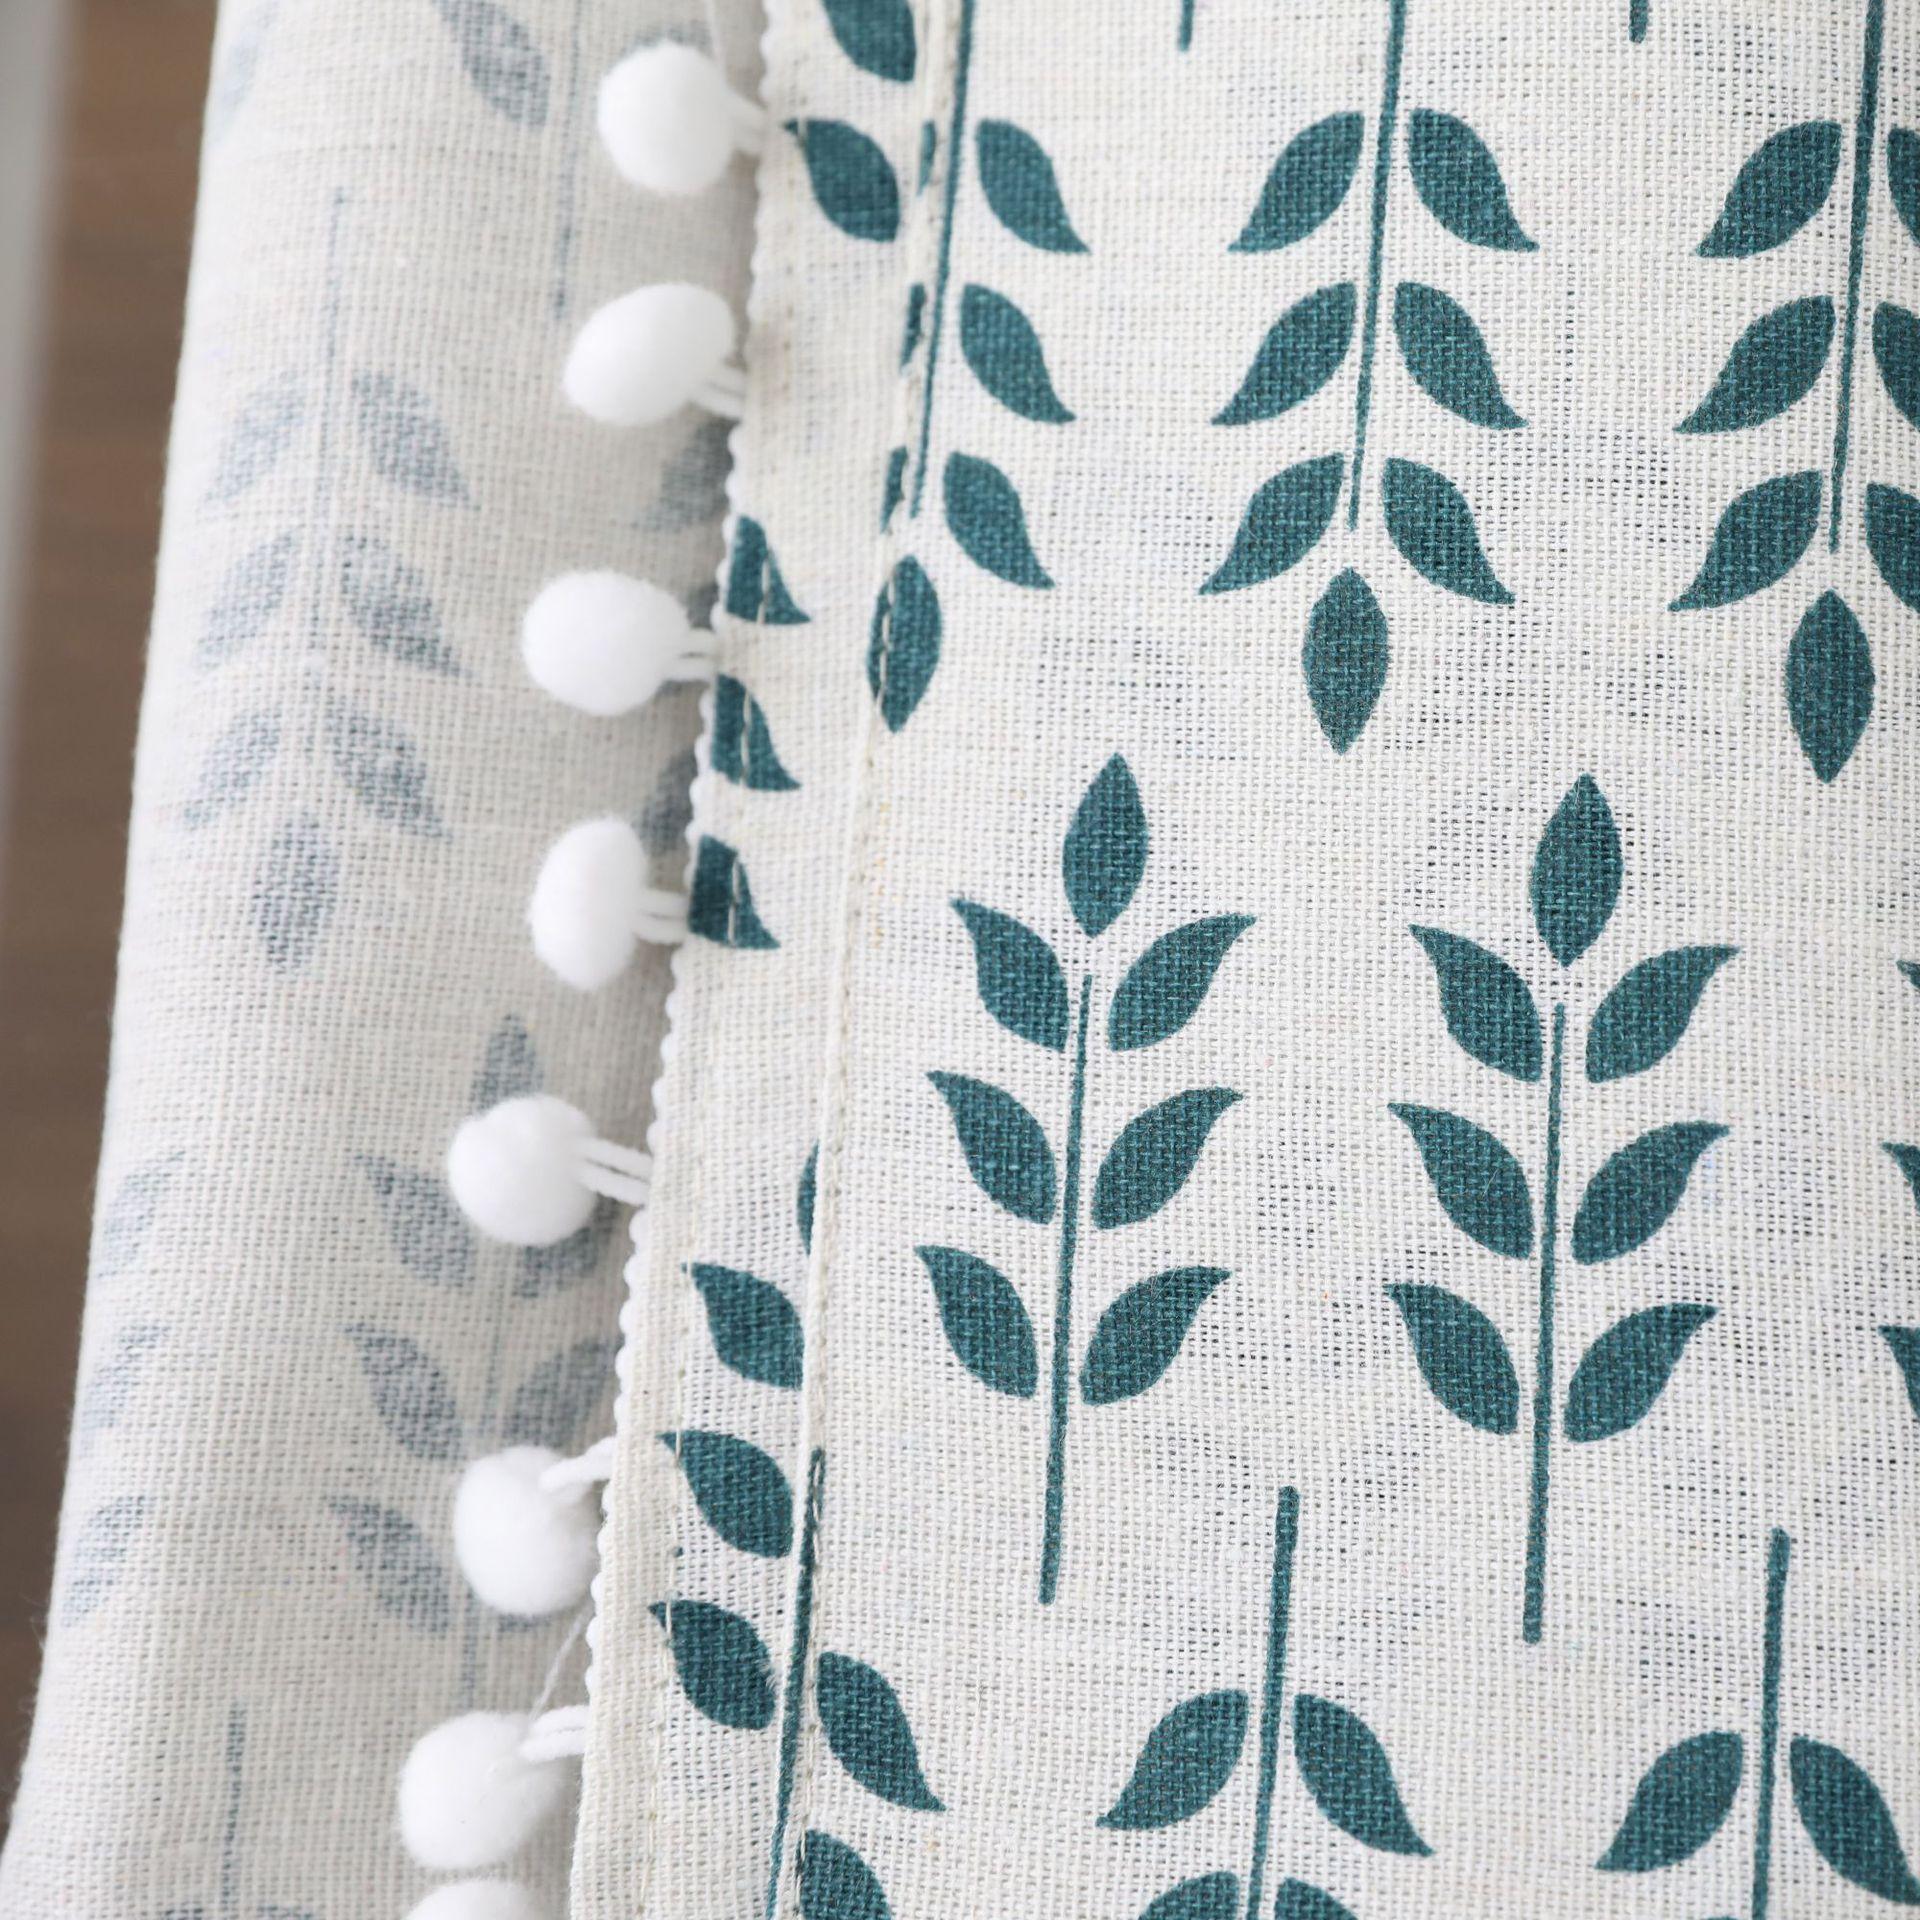 Home Decor Green Wheat Ear Table Cloth with Three Pocket Nappe TV Bench Mantel Rectangular Tea Table Cover Toalha De Mesa